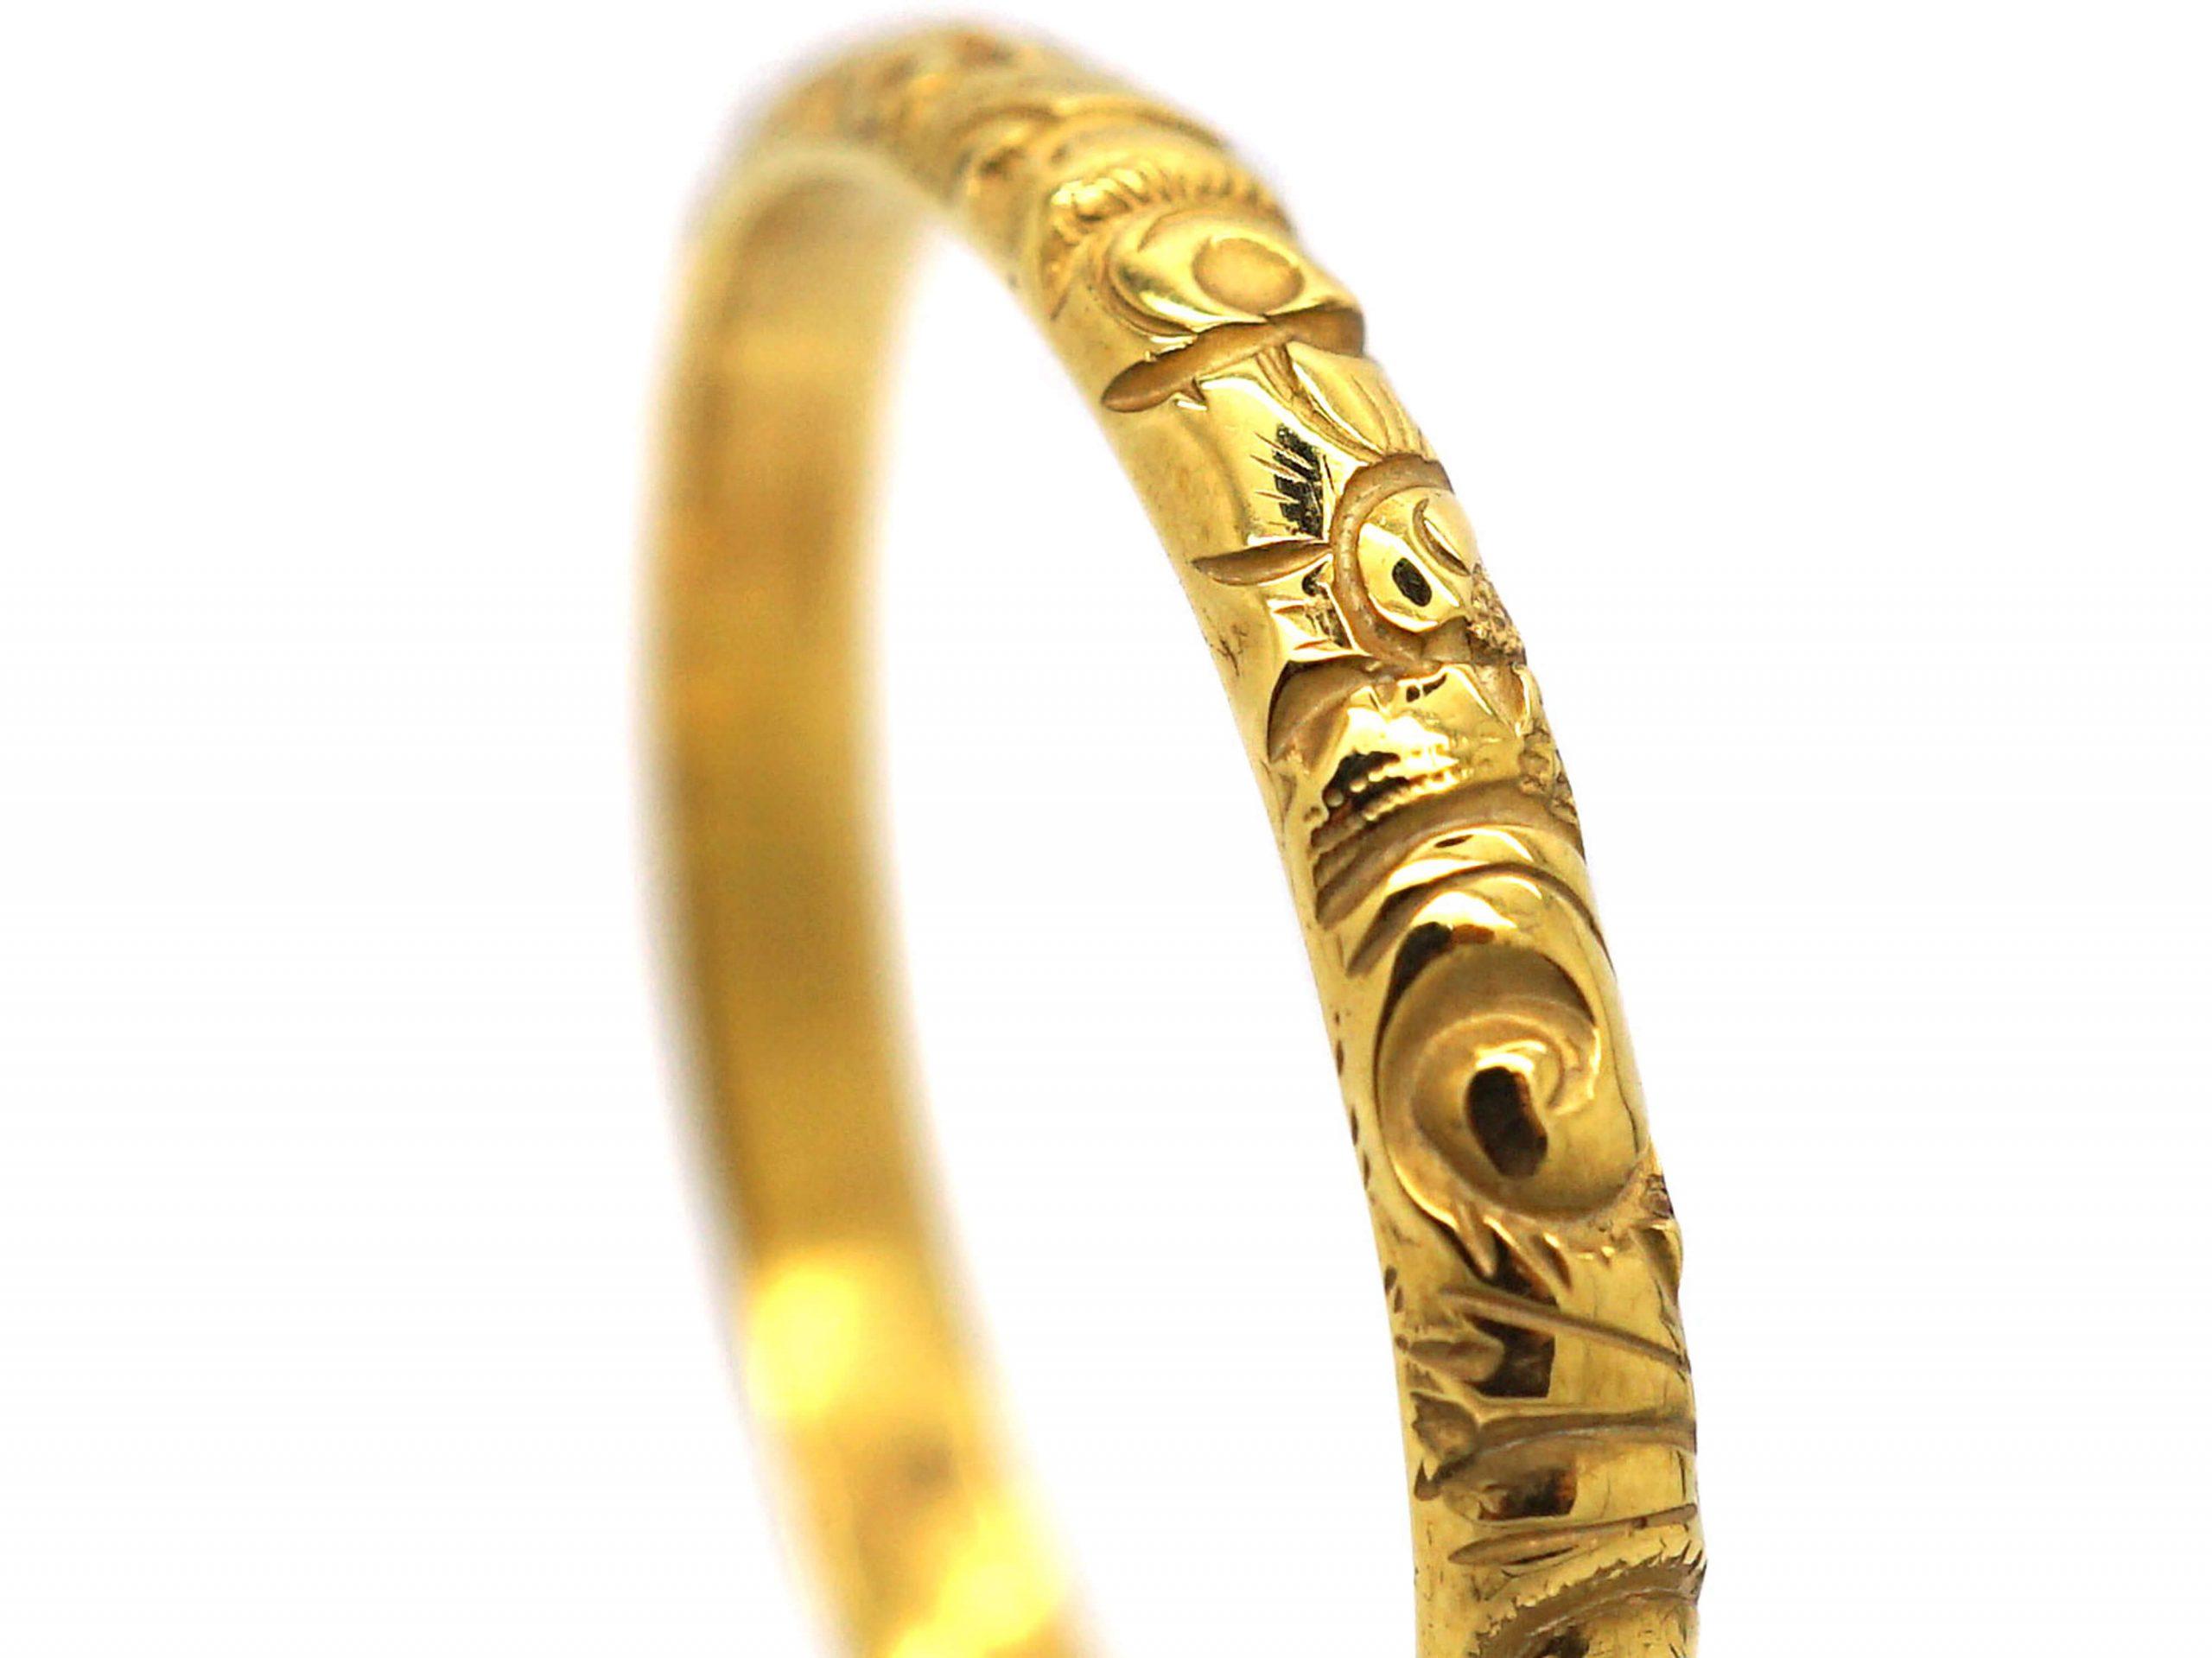 Georgian 18ct Gold Wedding Band with Repoussé Decoration